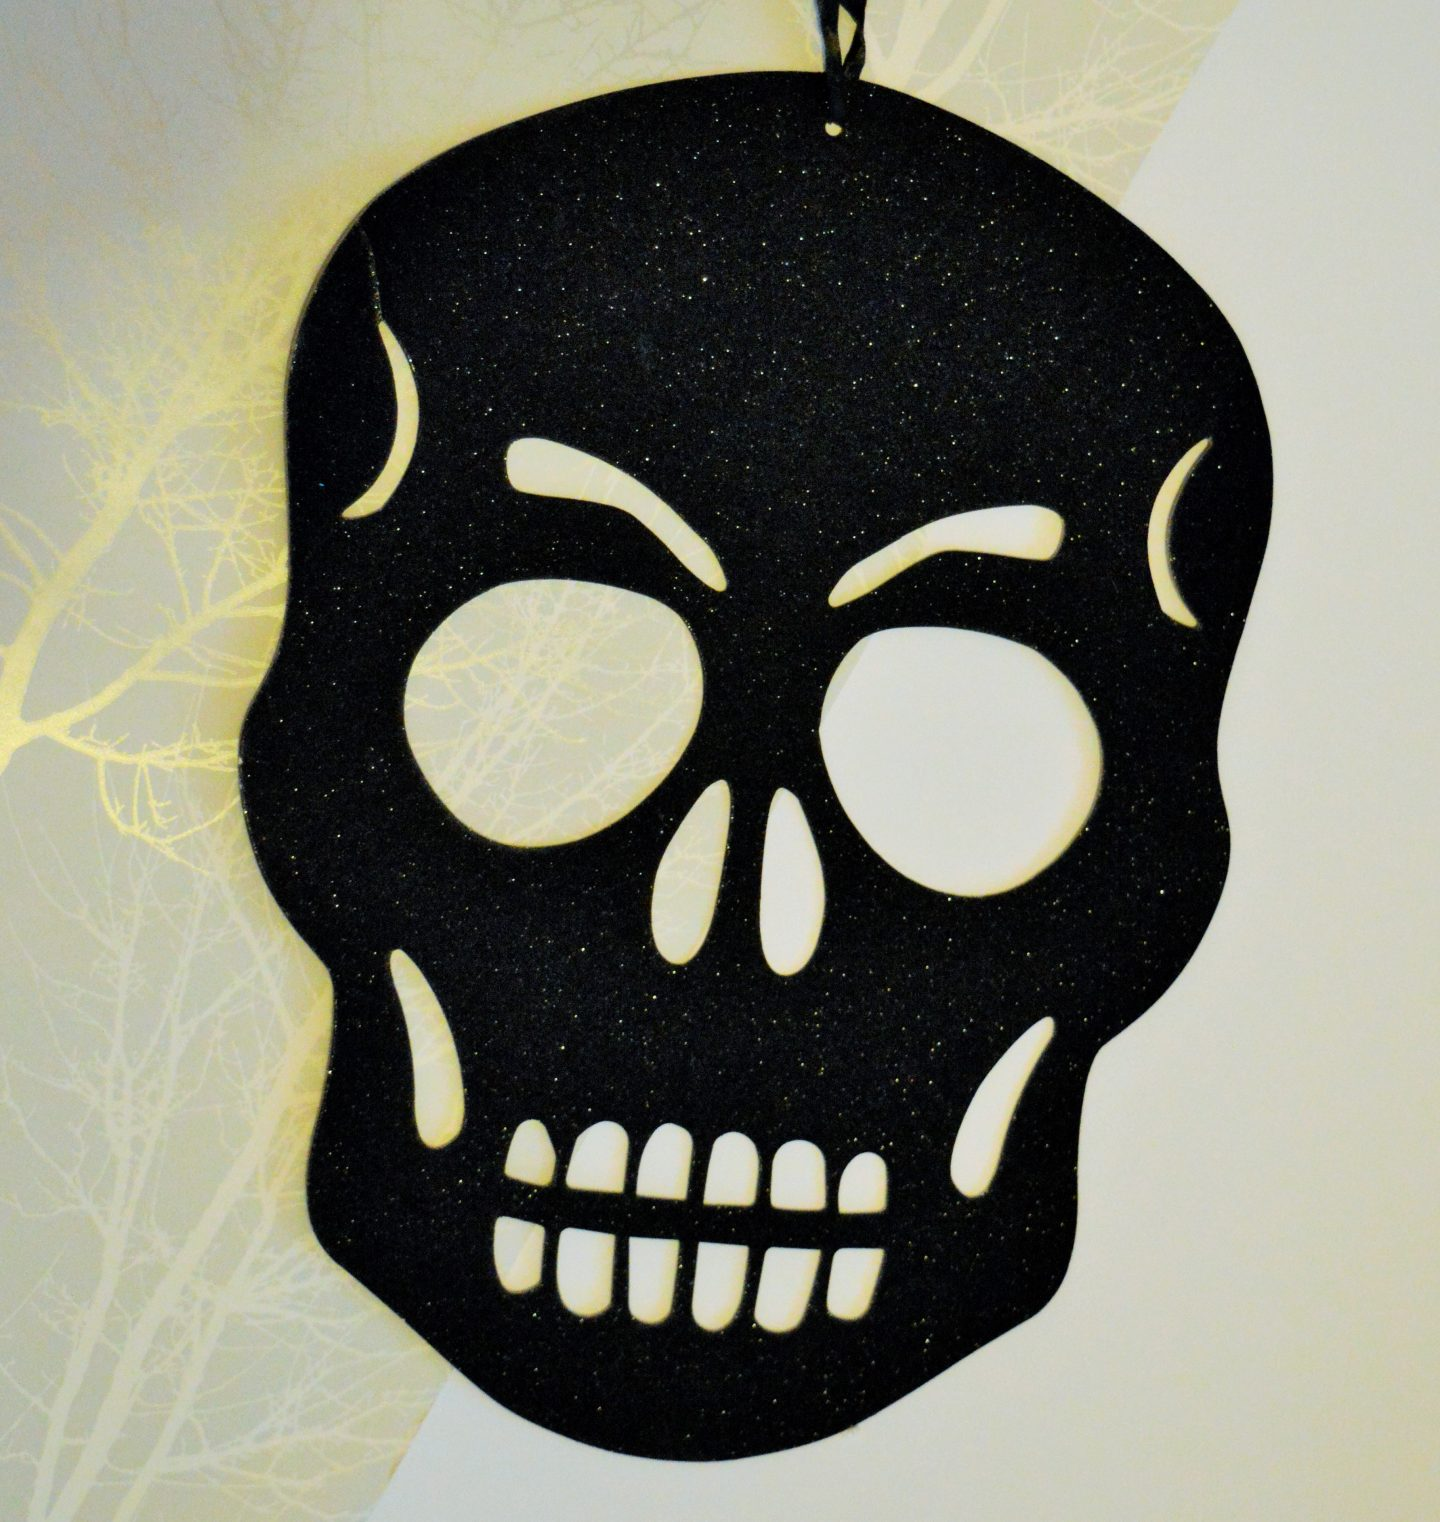 Halloween decorations from Wilko black skull